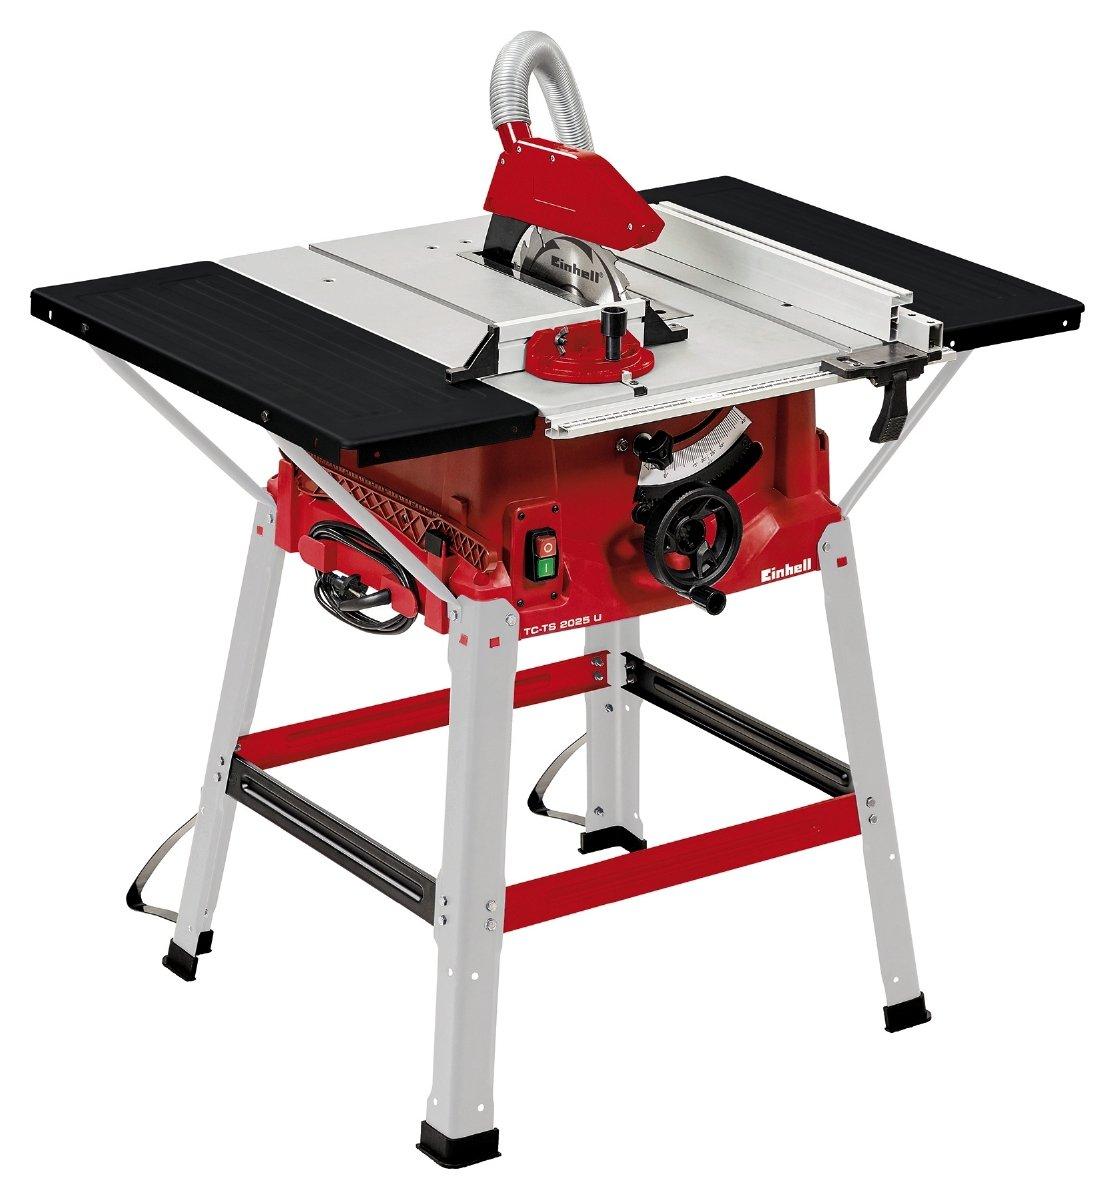 "Einhell 2000W 250mm ( 10"" ) Table Saw & Base Unit , Now £74.99 & 2 Yrs Guarantee @ Argos ( Free C&C )"